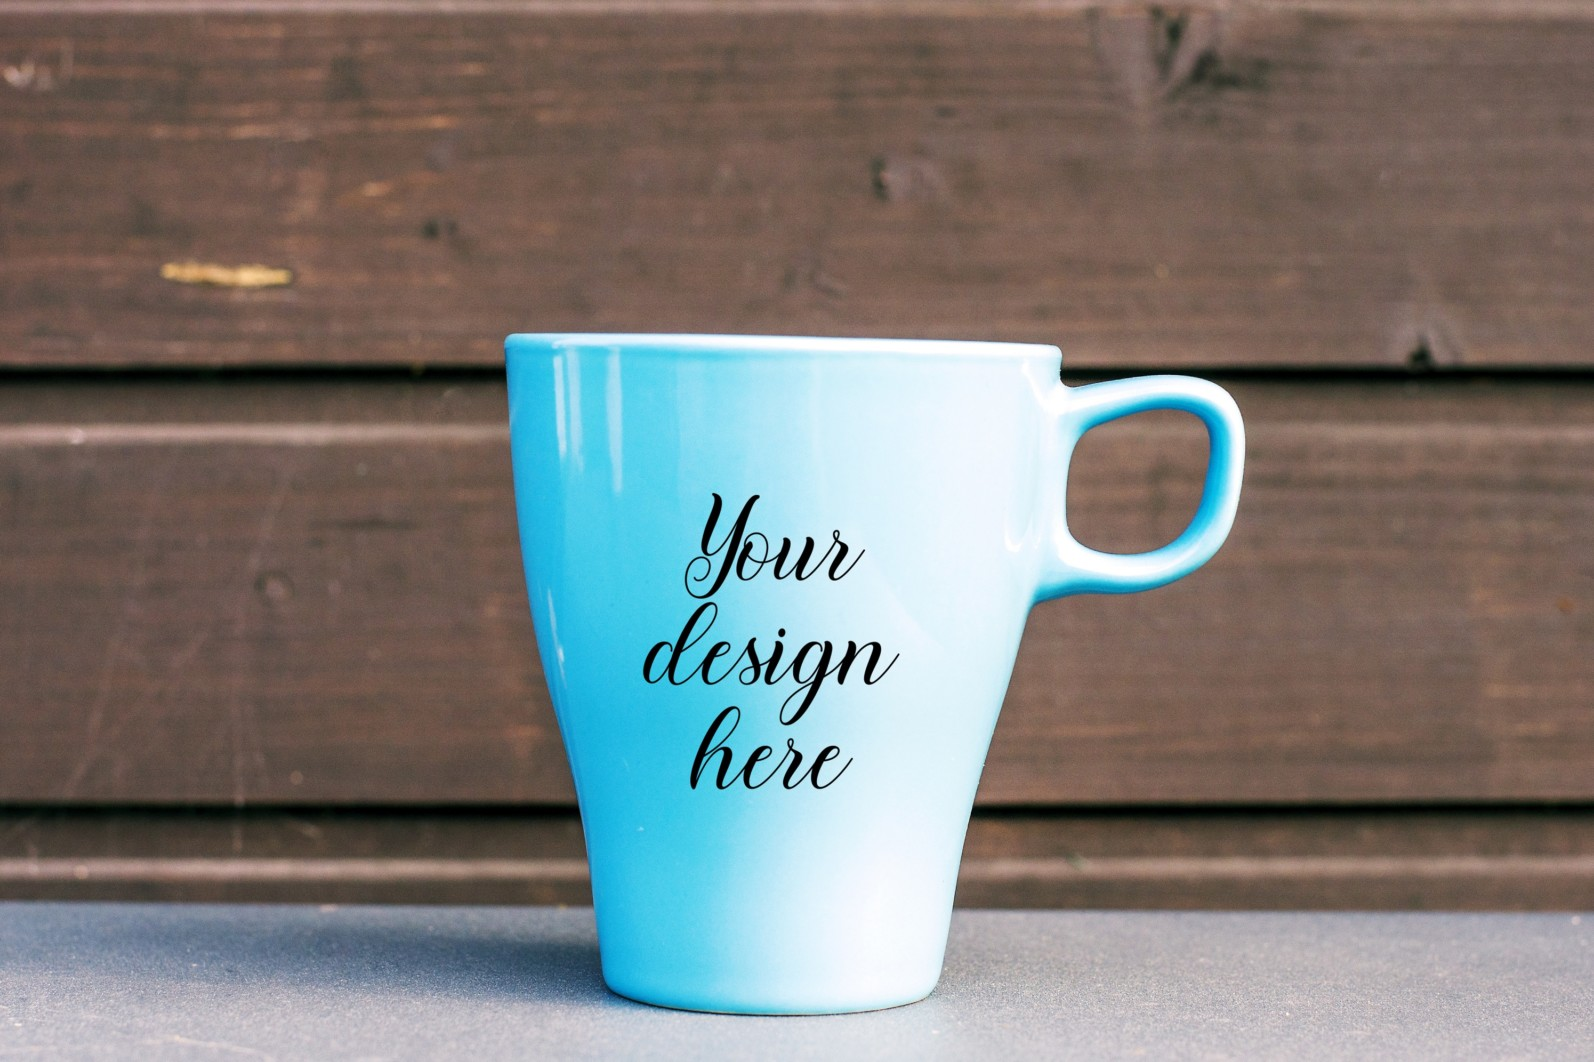 Coffee mug mockup bundle. Mug template bundle. PSD, JPEG files. - 13 1 1 scaled -